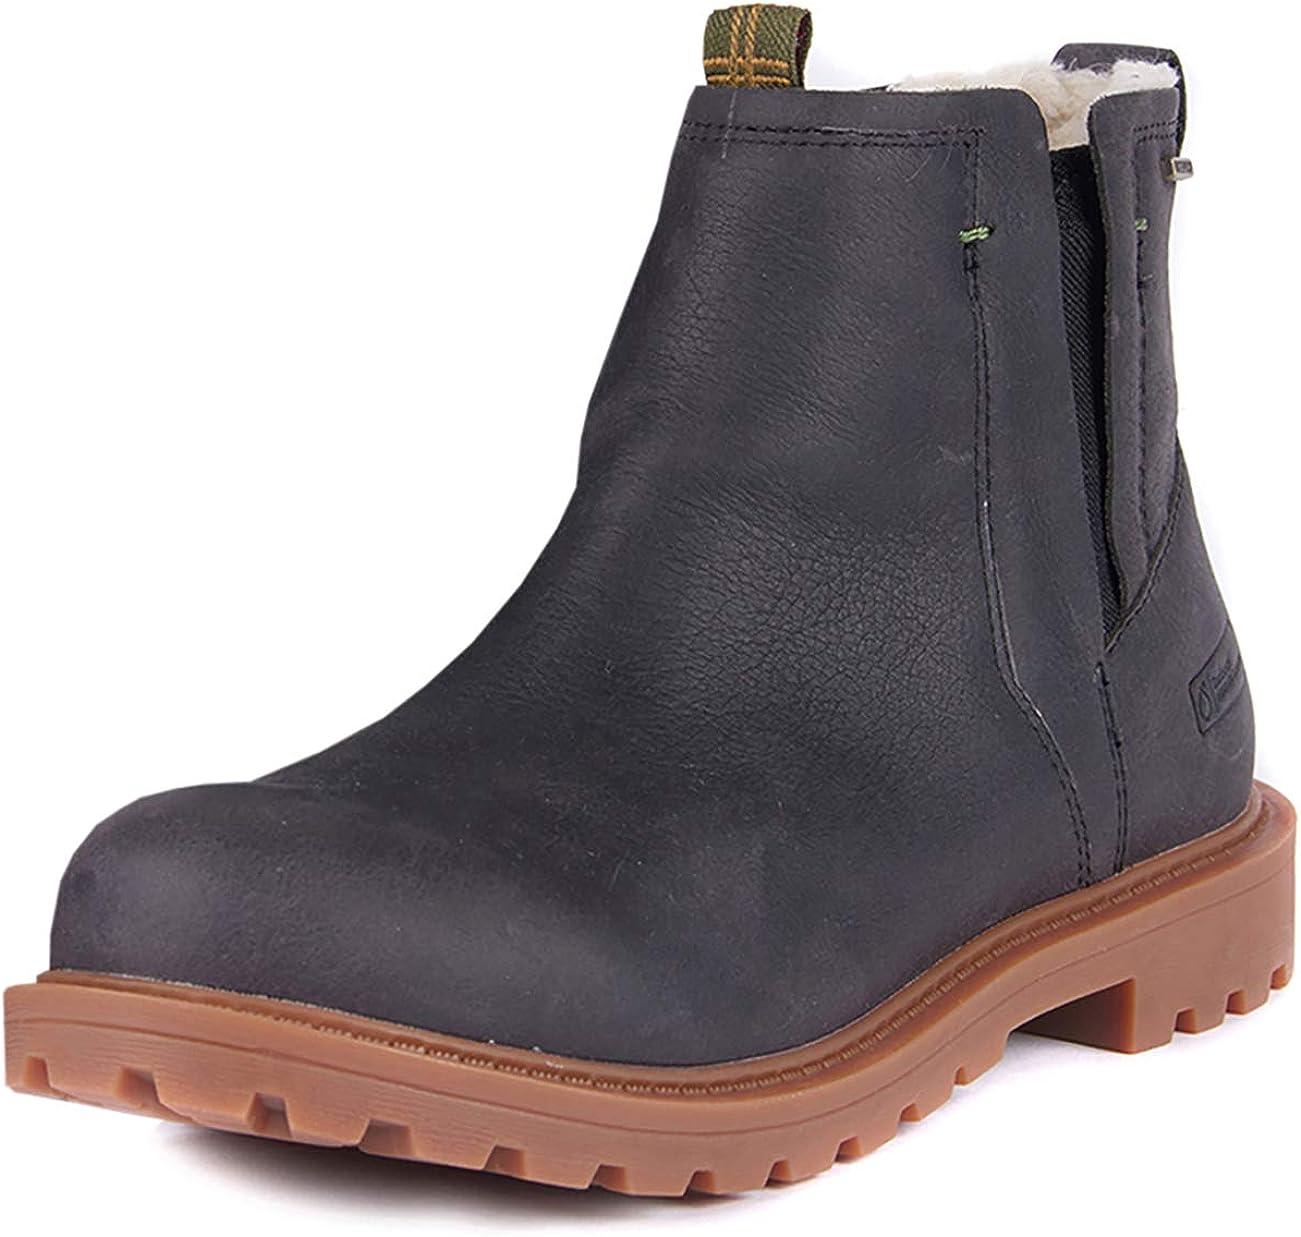 Barbour Womens お買い得 Hackfall Winter (人気激安) Hiking Faux Leather Fur B Chelsea